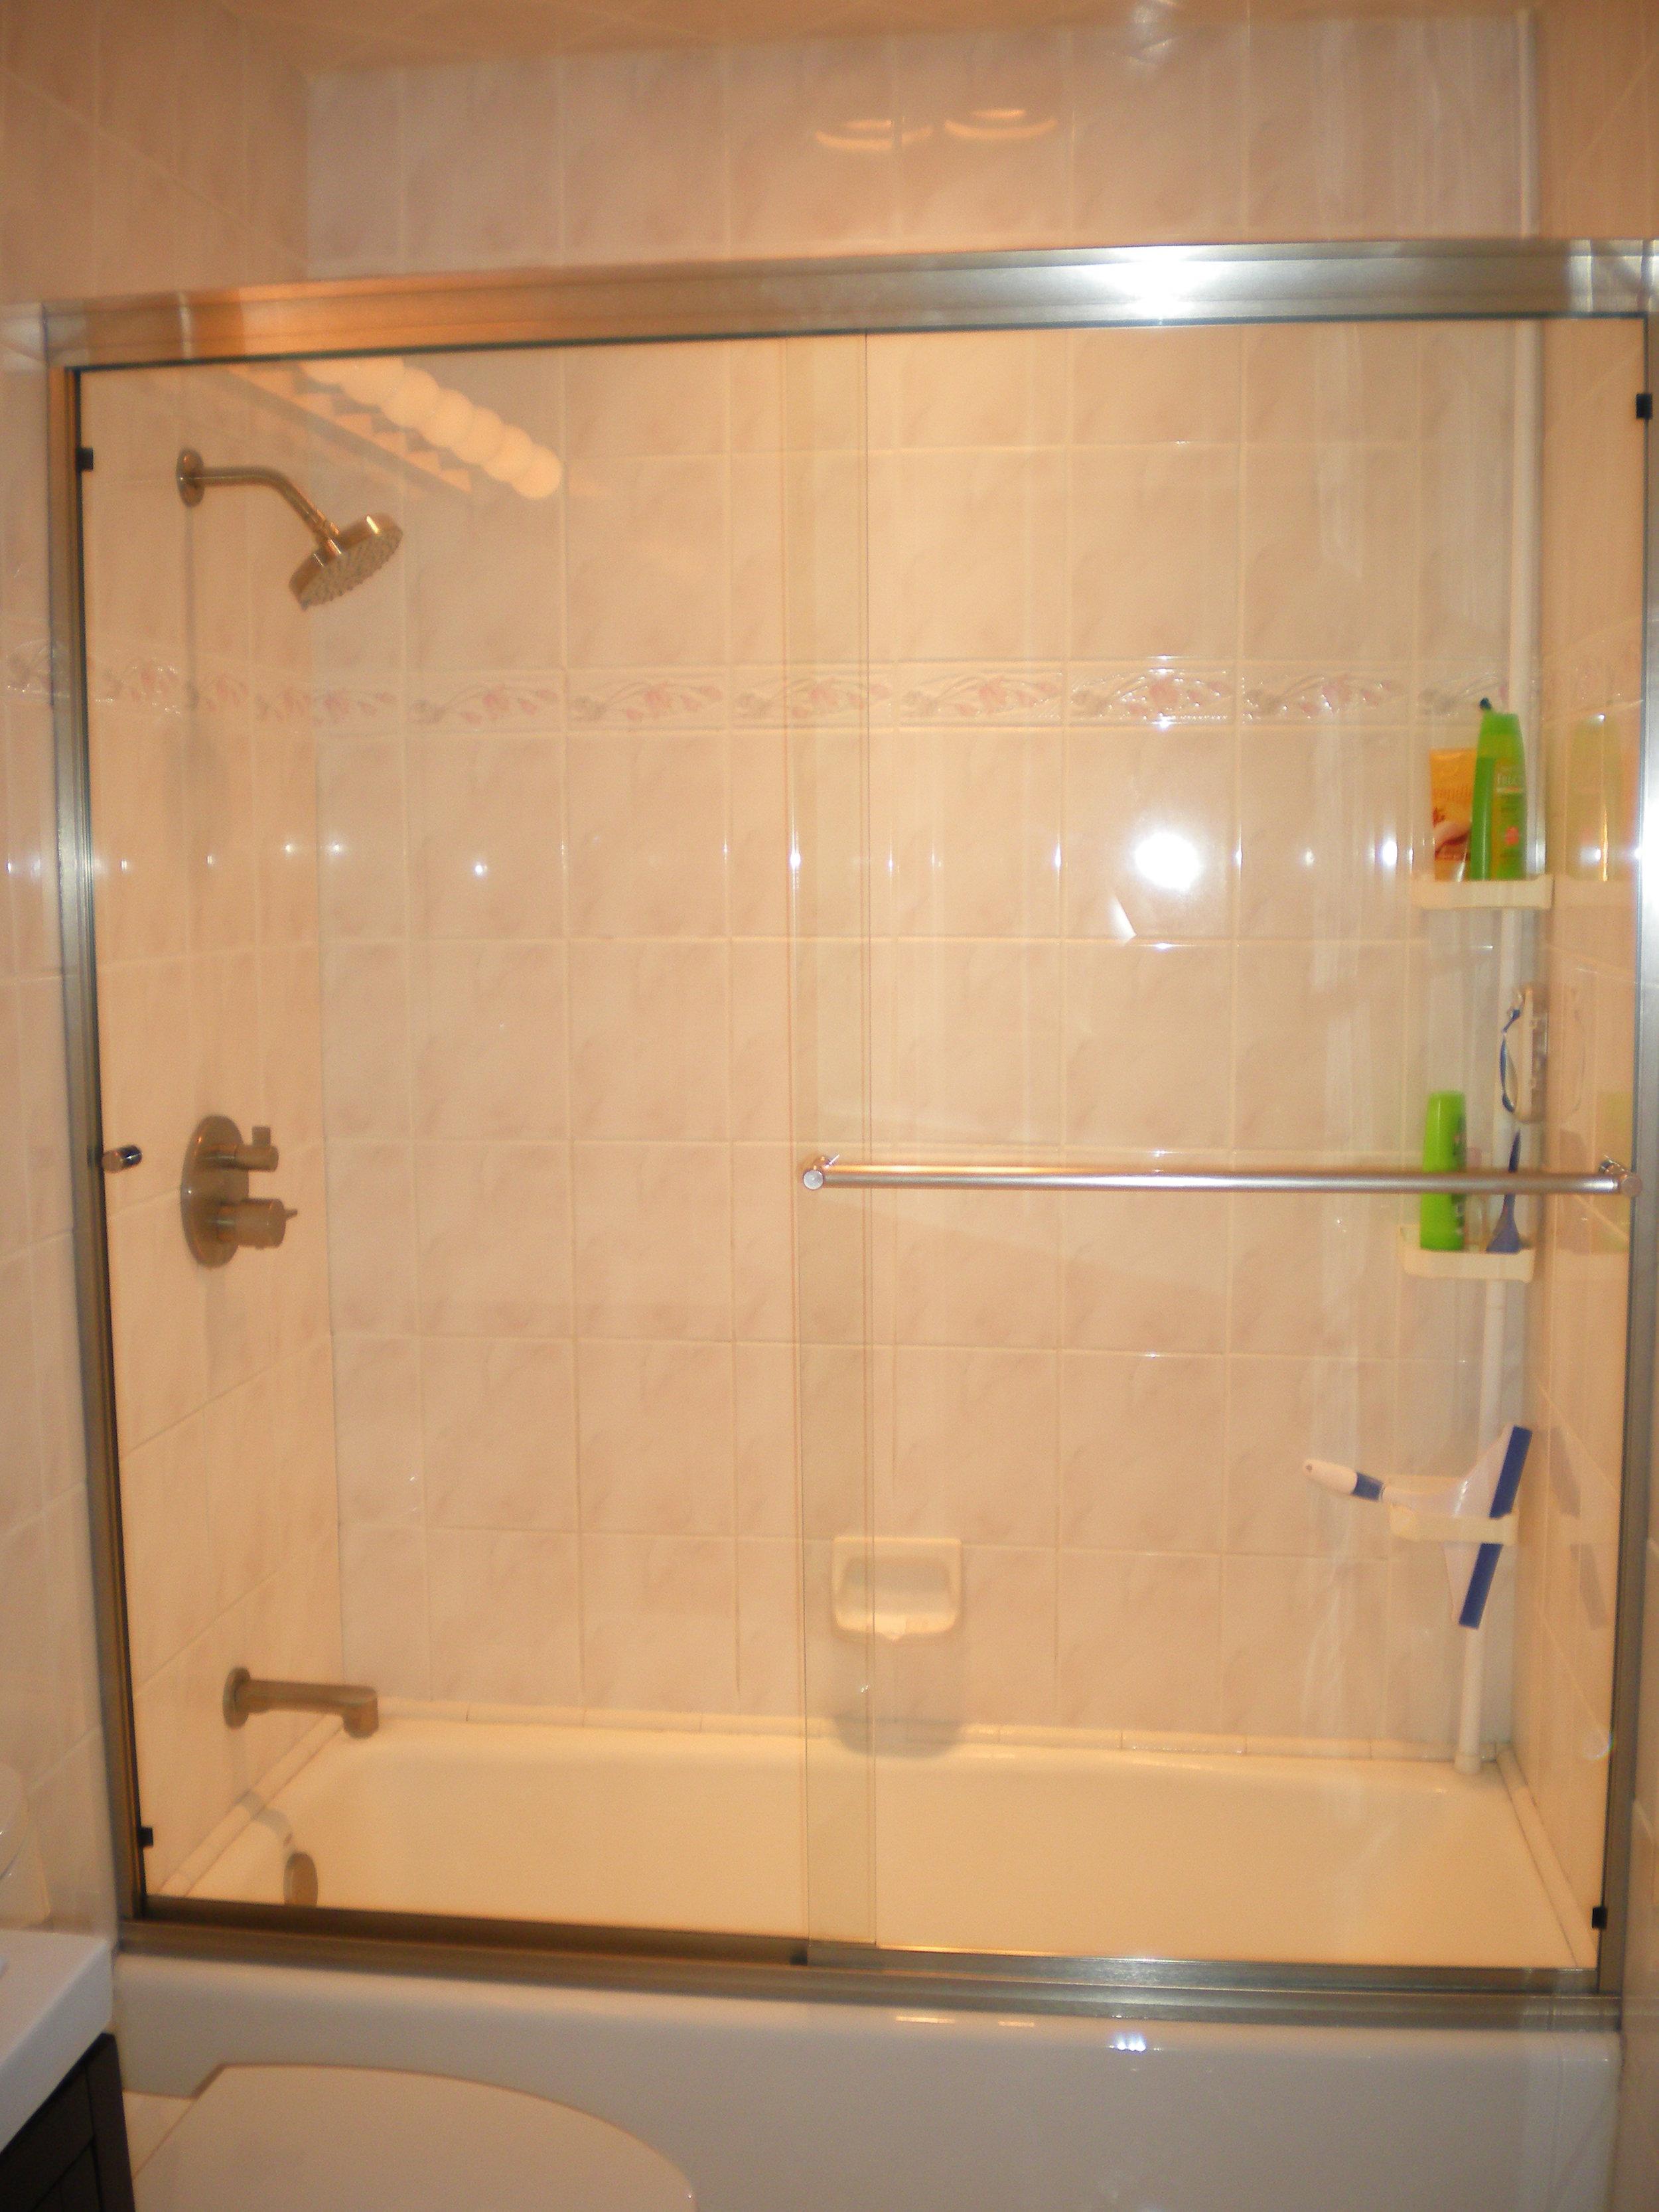 Shower-Doors-Residential-Photos-37.jpg